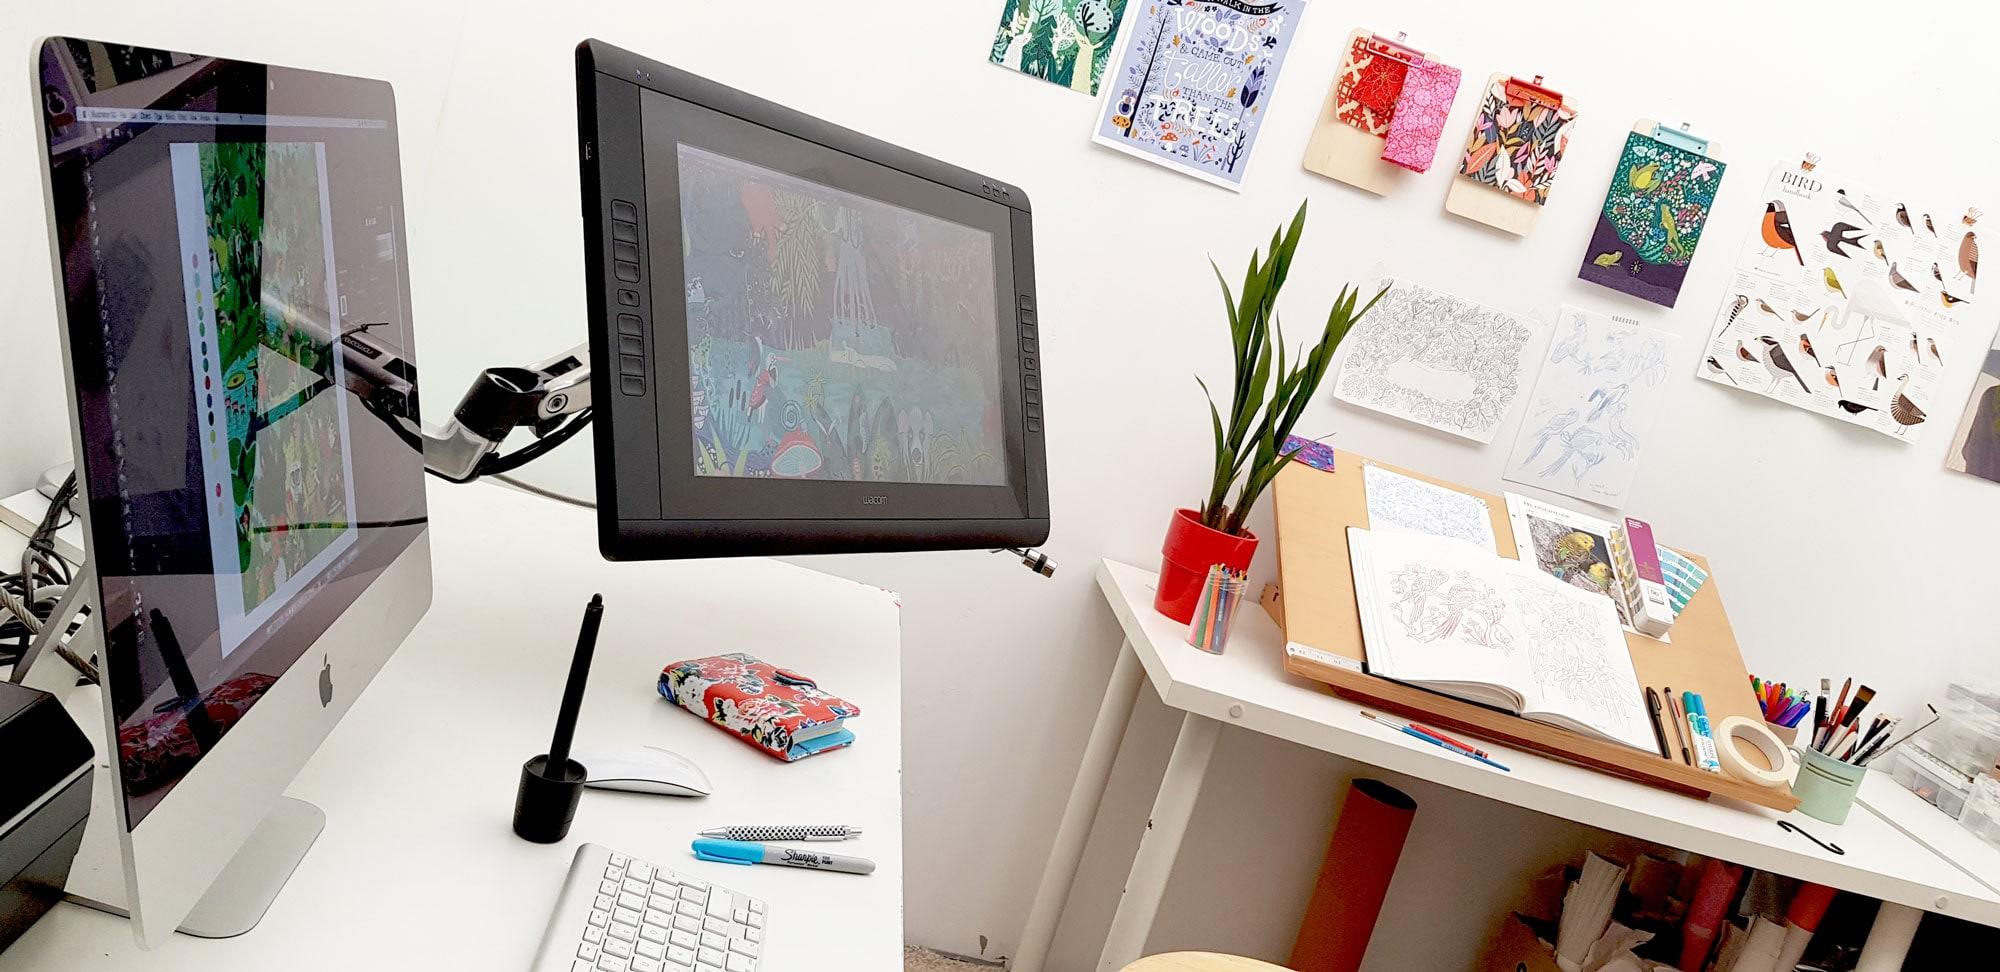 Studio_03_Screens_and_Drawing